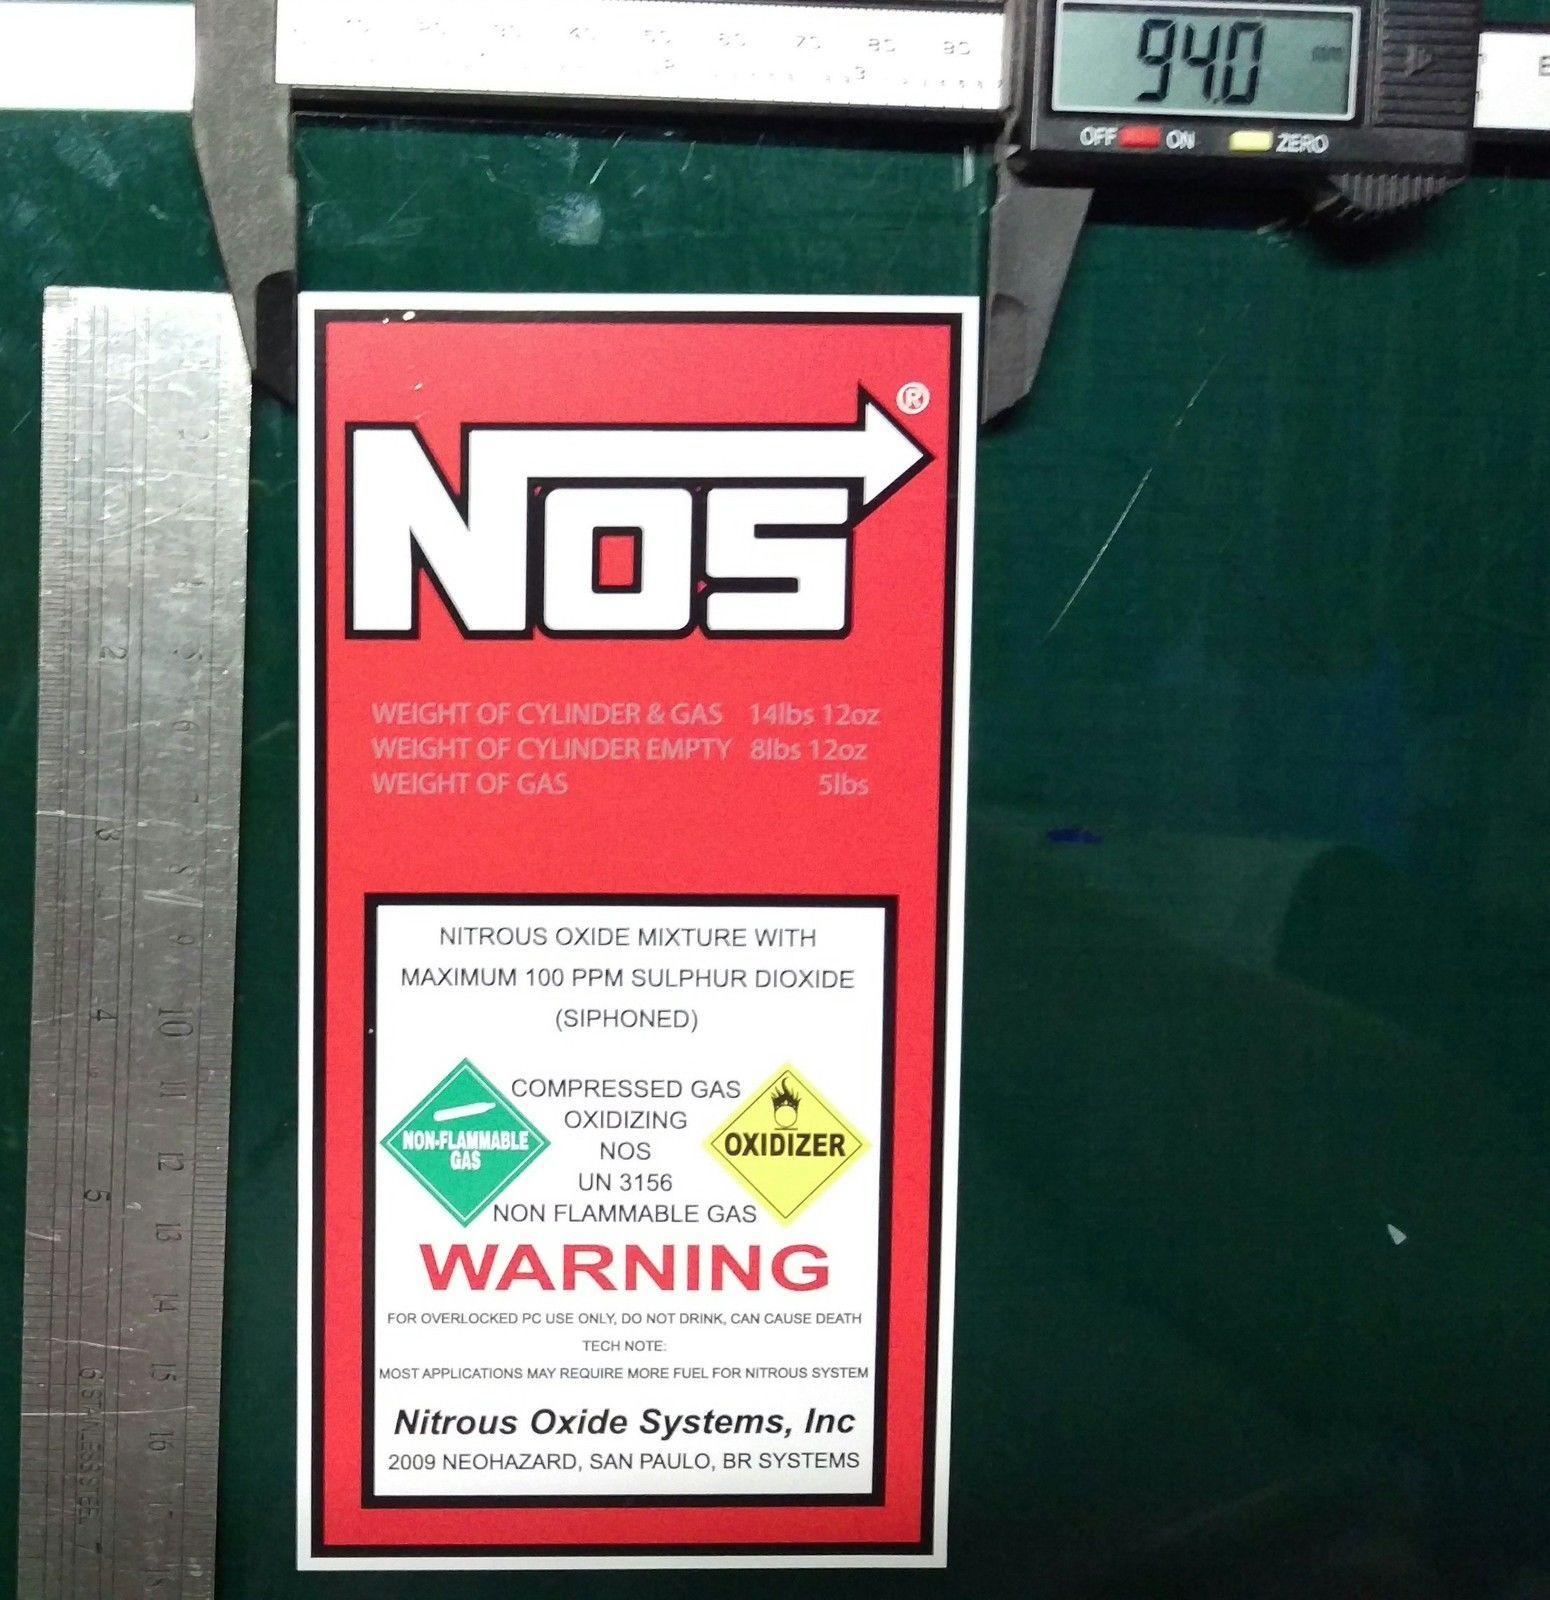 Car Fire Extinguisher Price In Uae